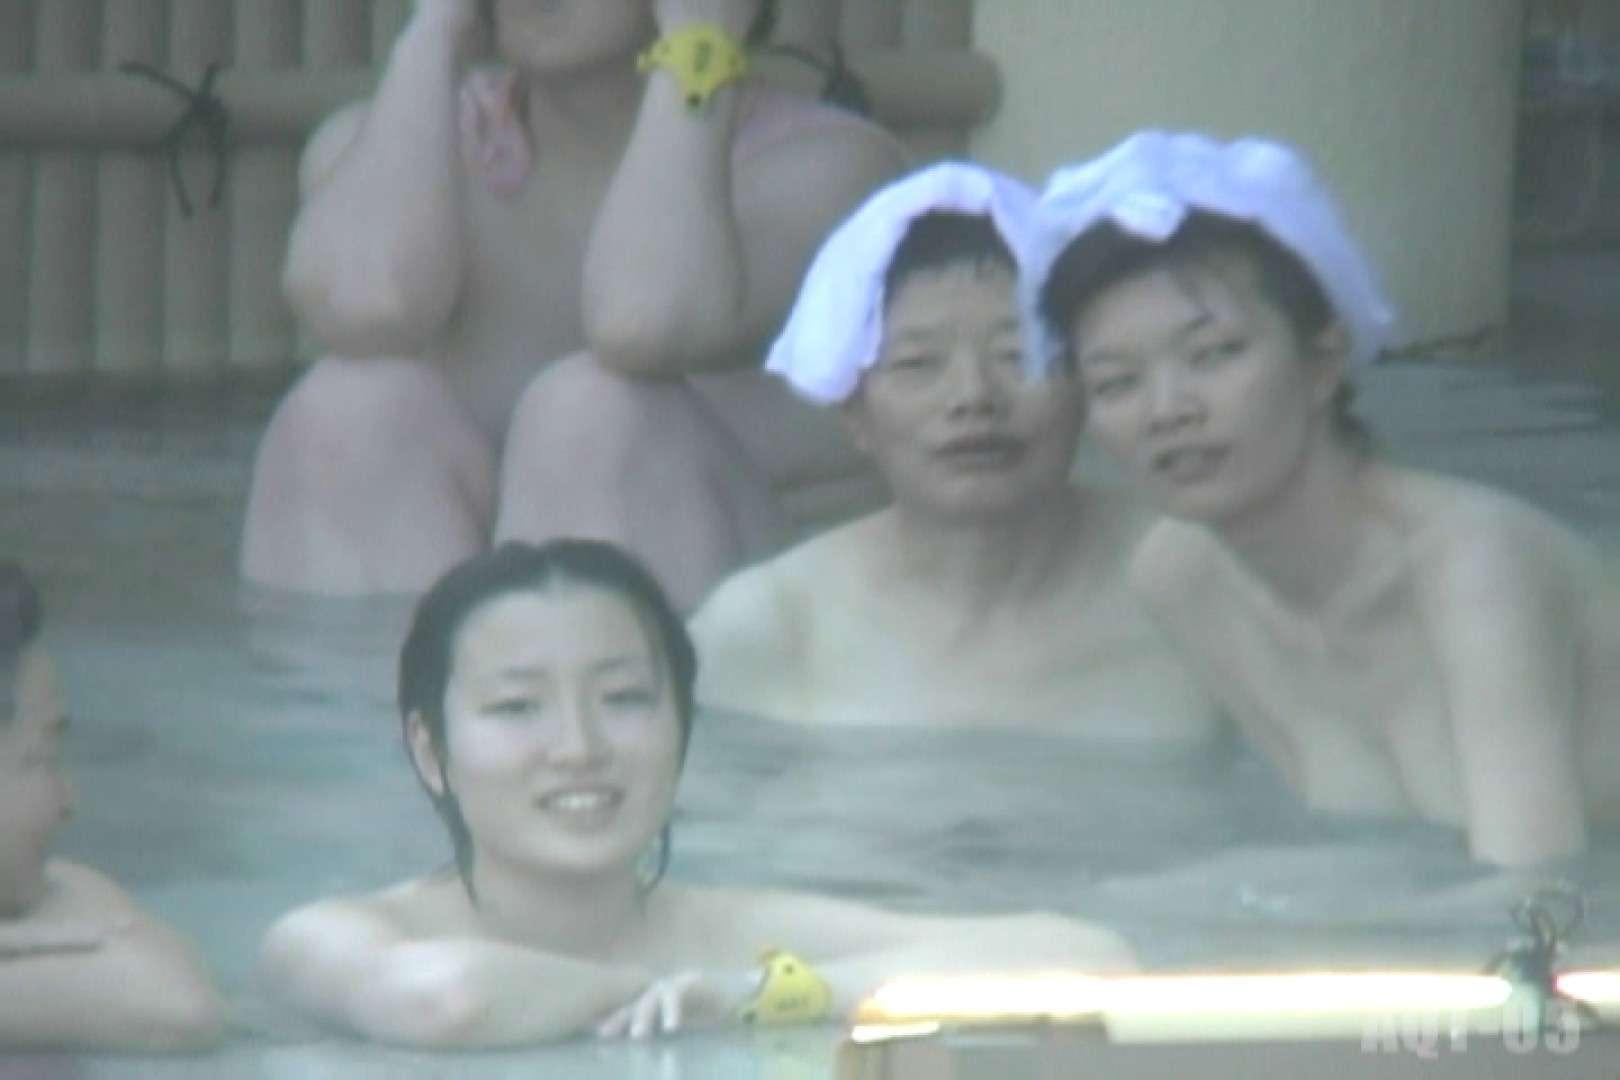 Aquaな露天風呂Vol.746 露天風呂編  98PIX 26